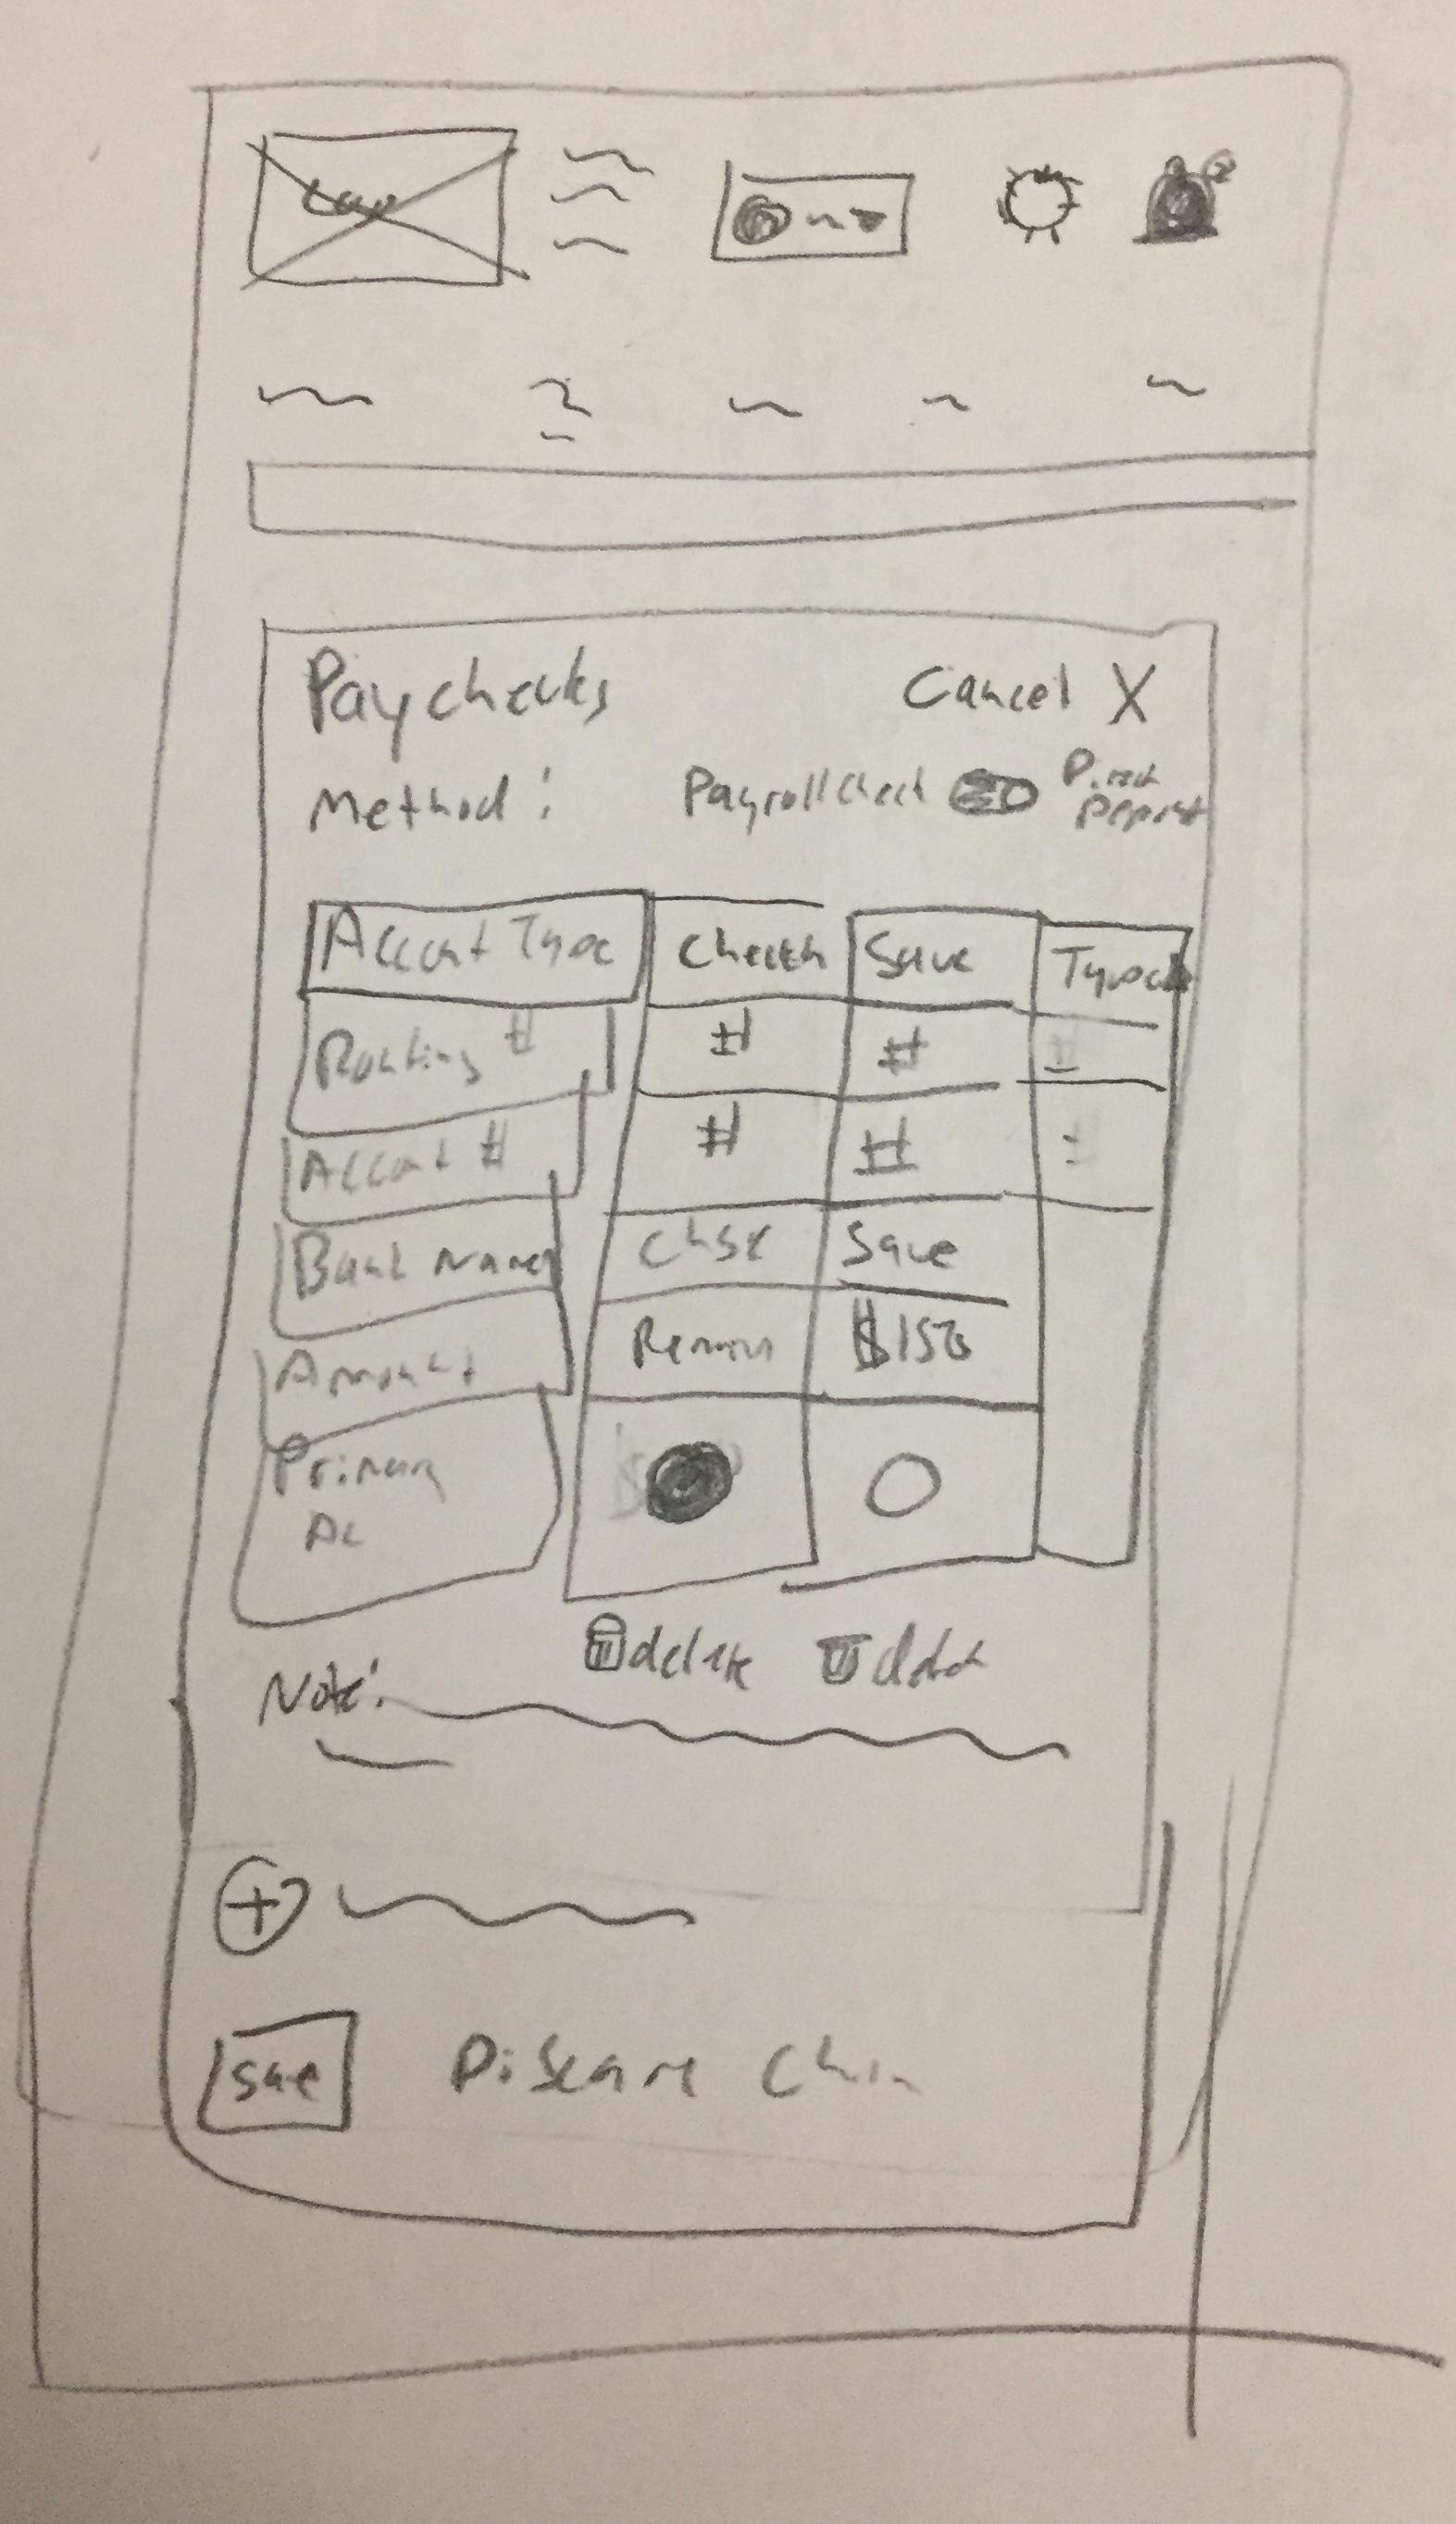 Internal Tool: Human Resources Mobile Web App